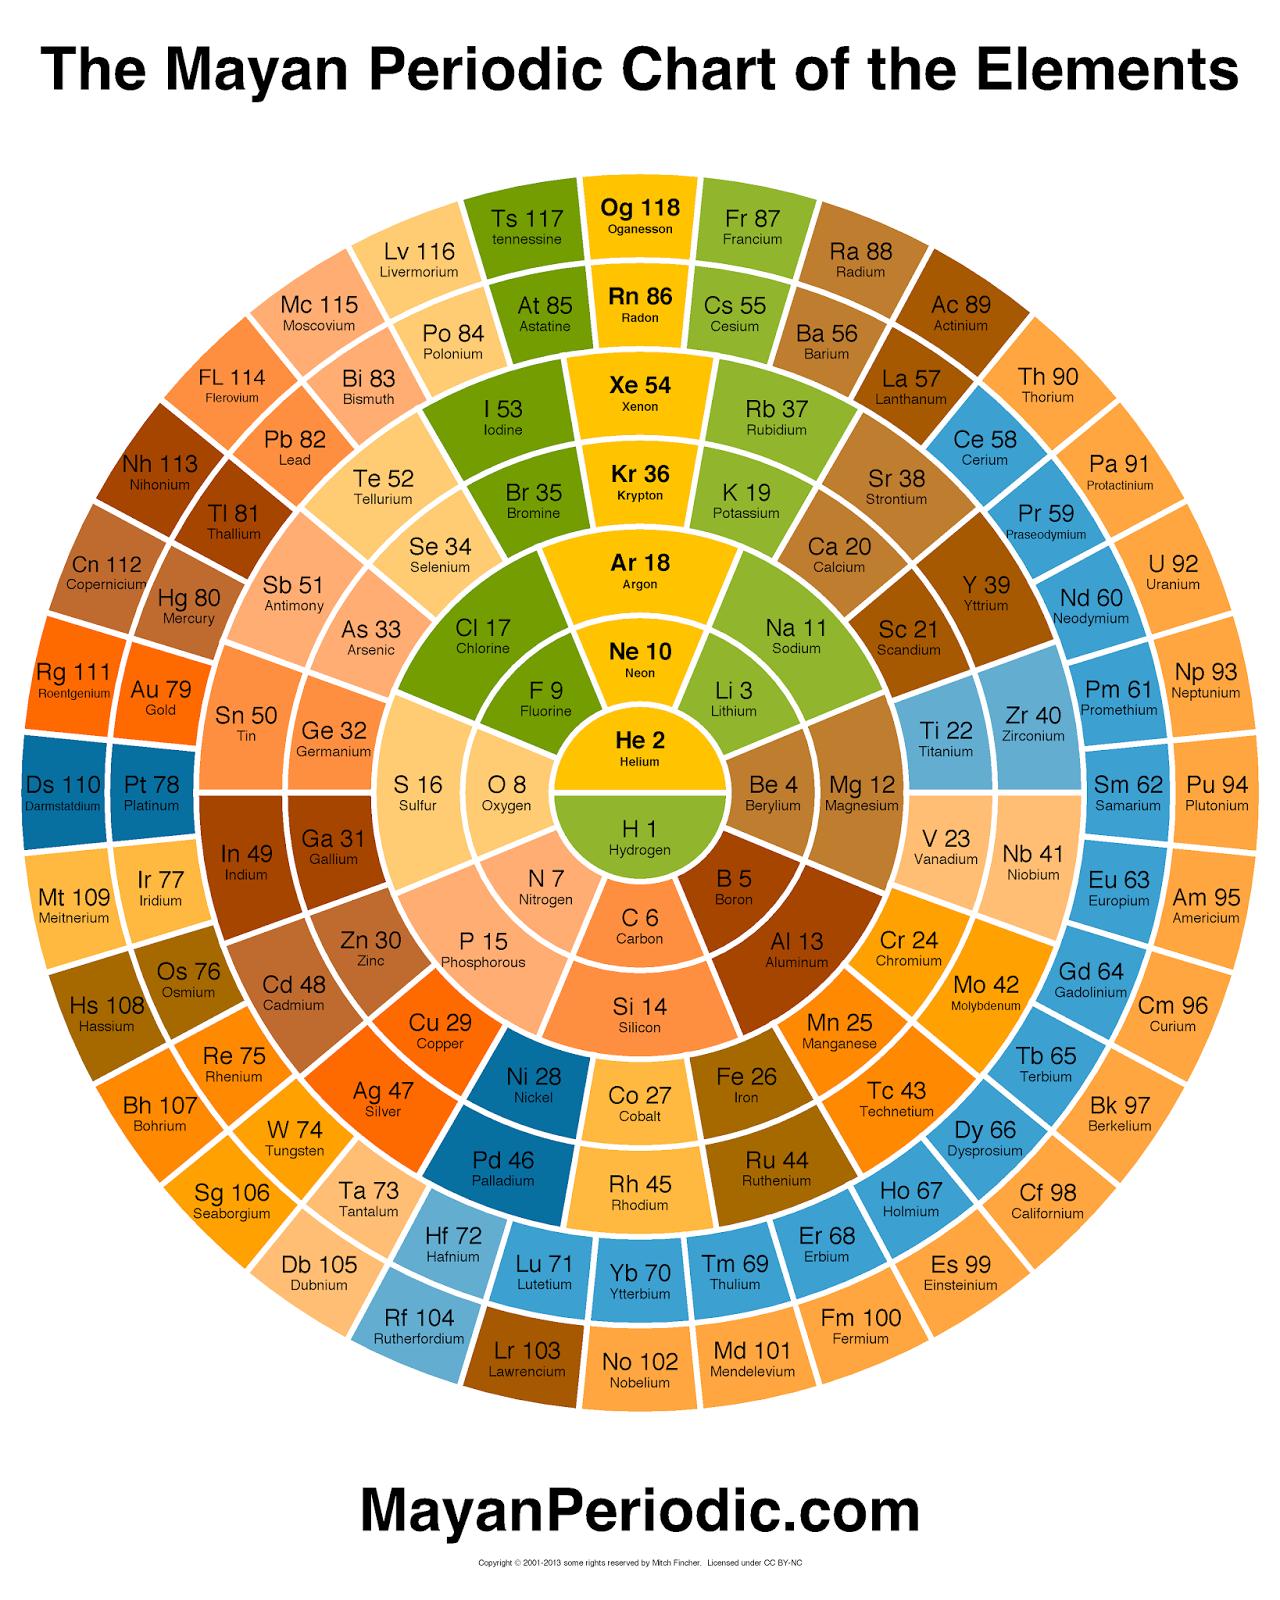 Tabla peridica maya tukimica tabla peridica maya urtaz Images